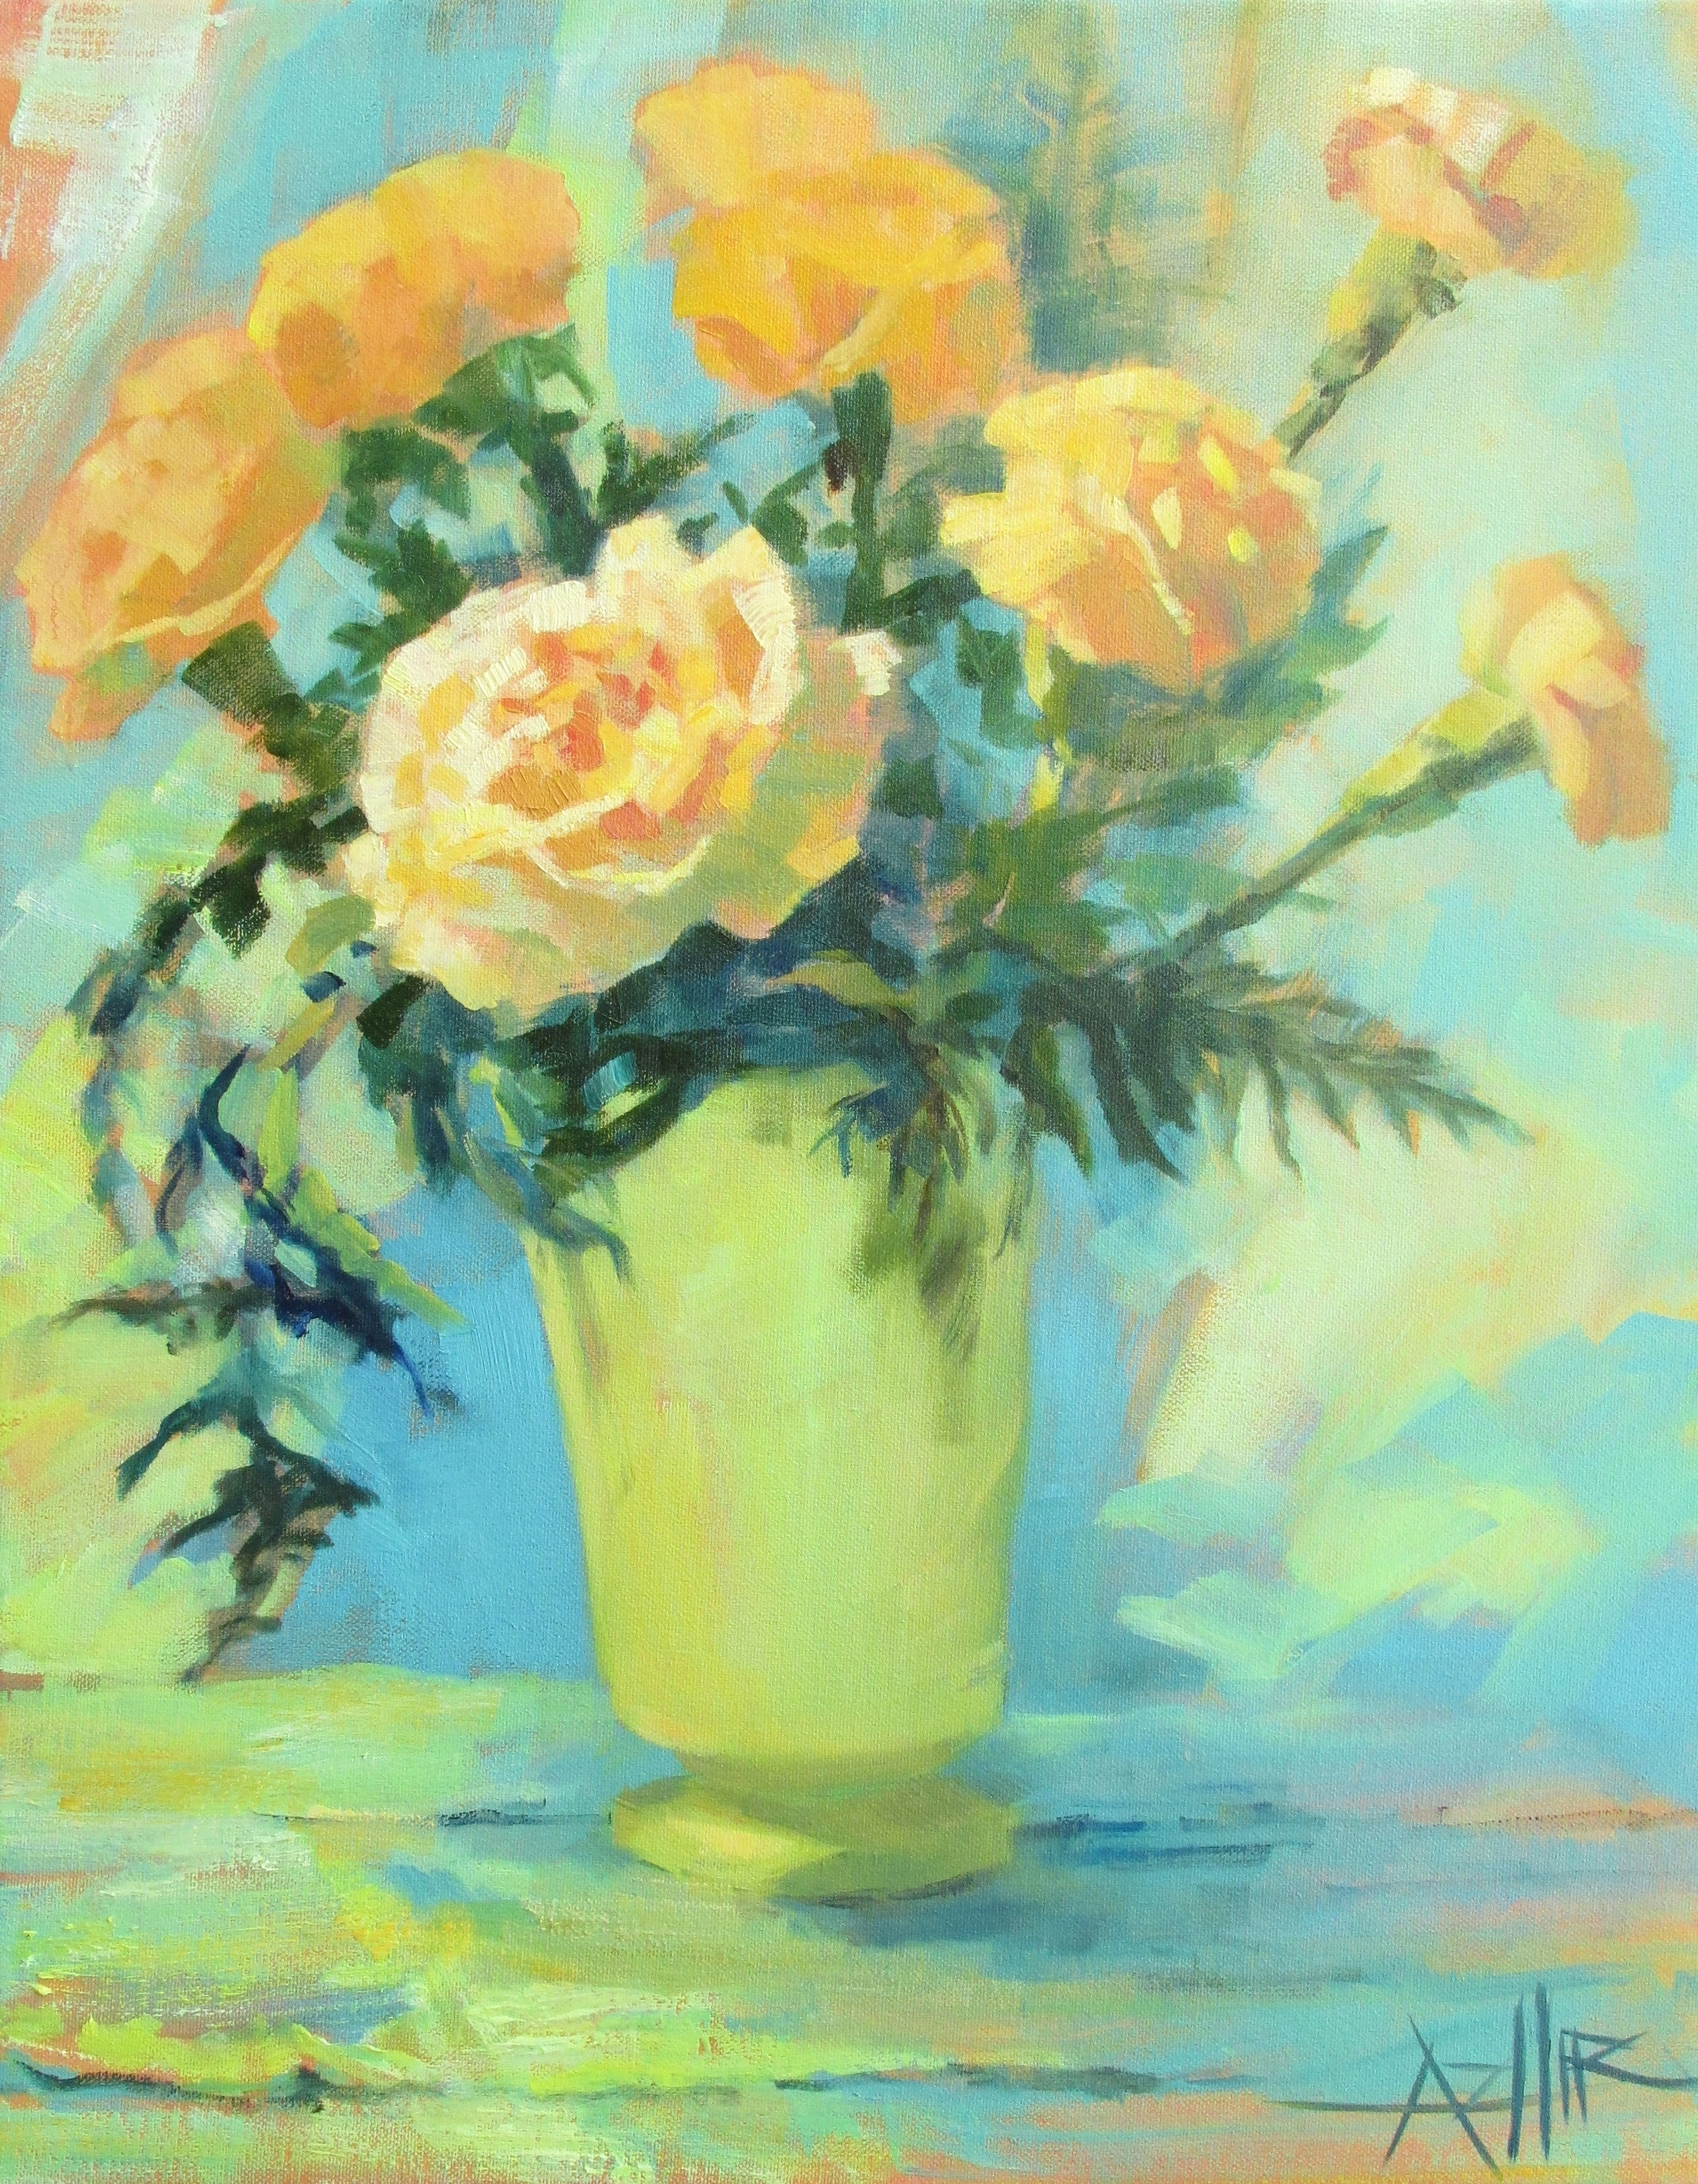 "SOLD, Carnations, Copyright 2015 Hirschten, Oil on Canvas, 16"" x 20"""